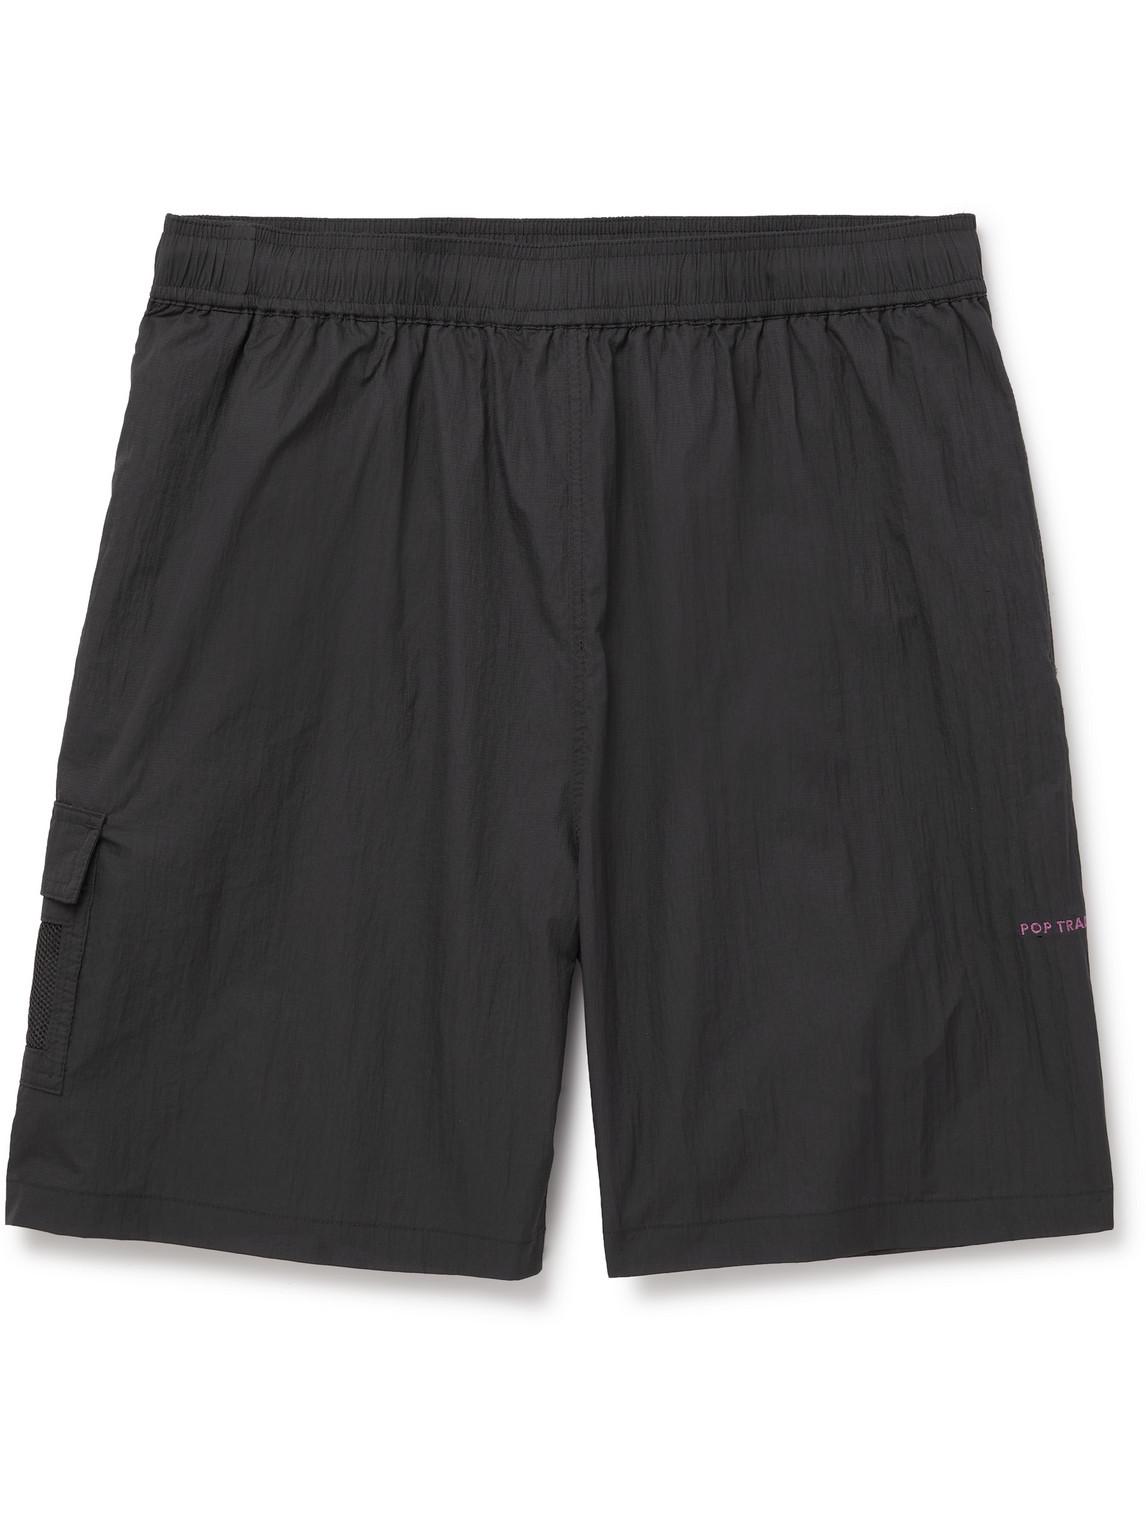 Pop Trading Company - Logo-Embroidered Shell Shorts - Men - Gray - M